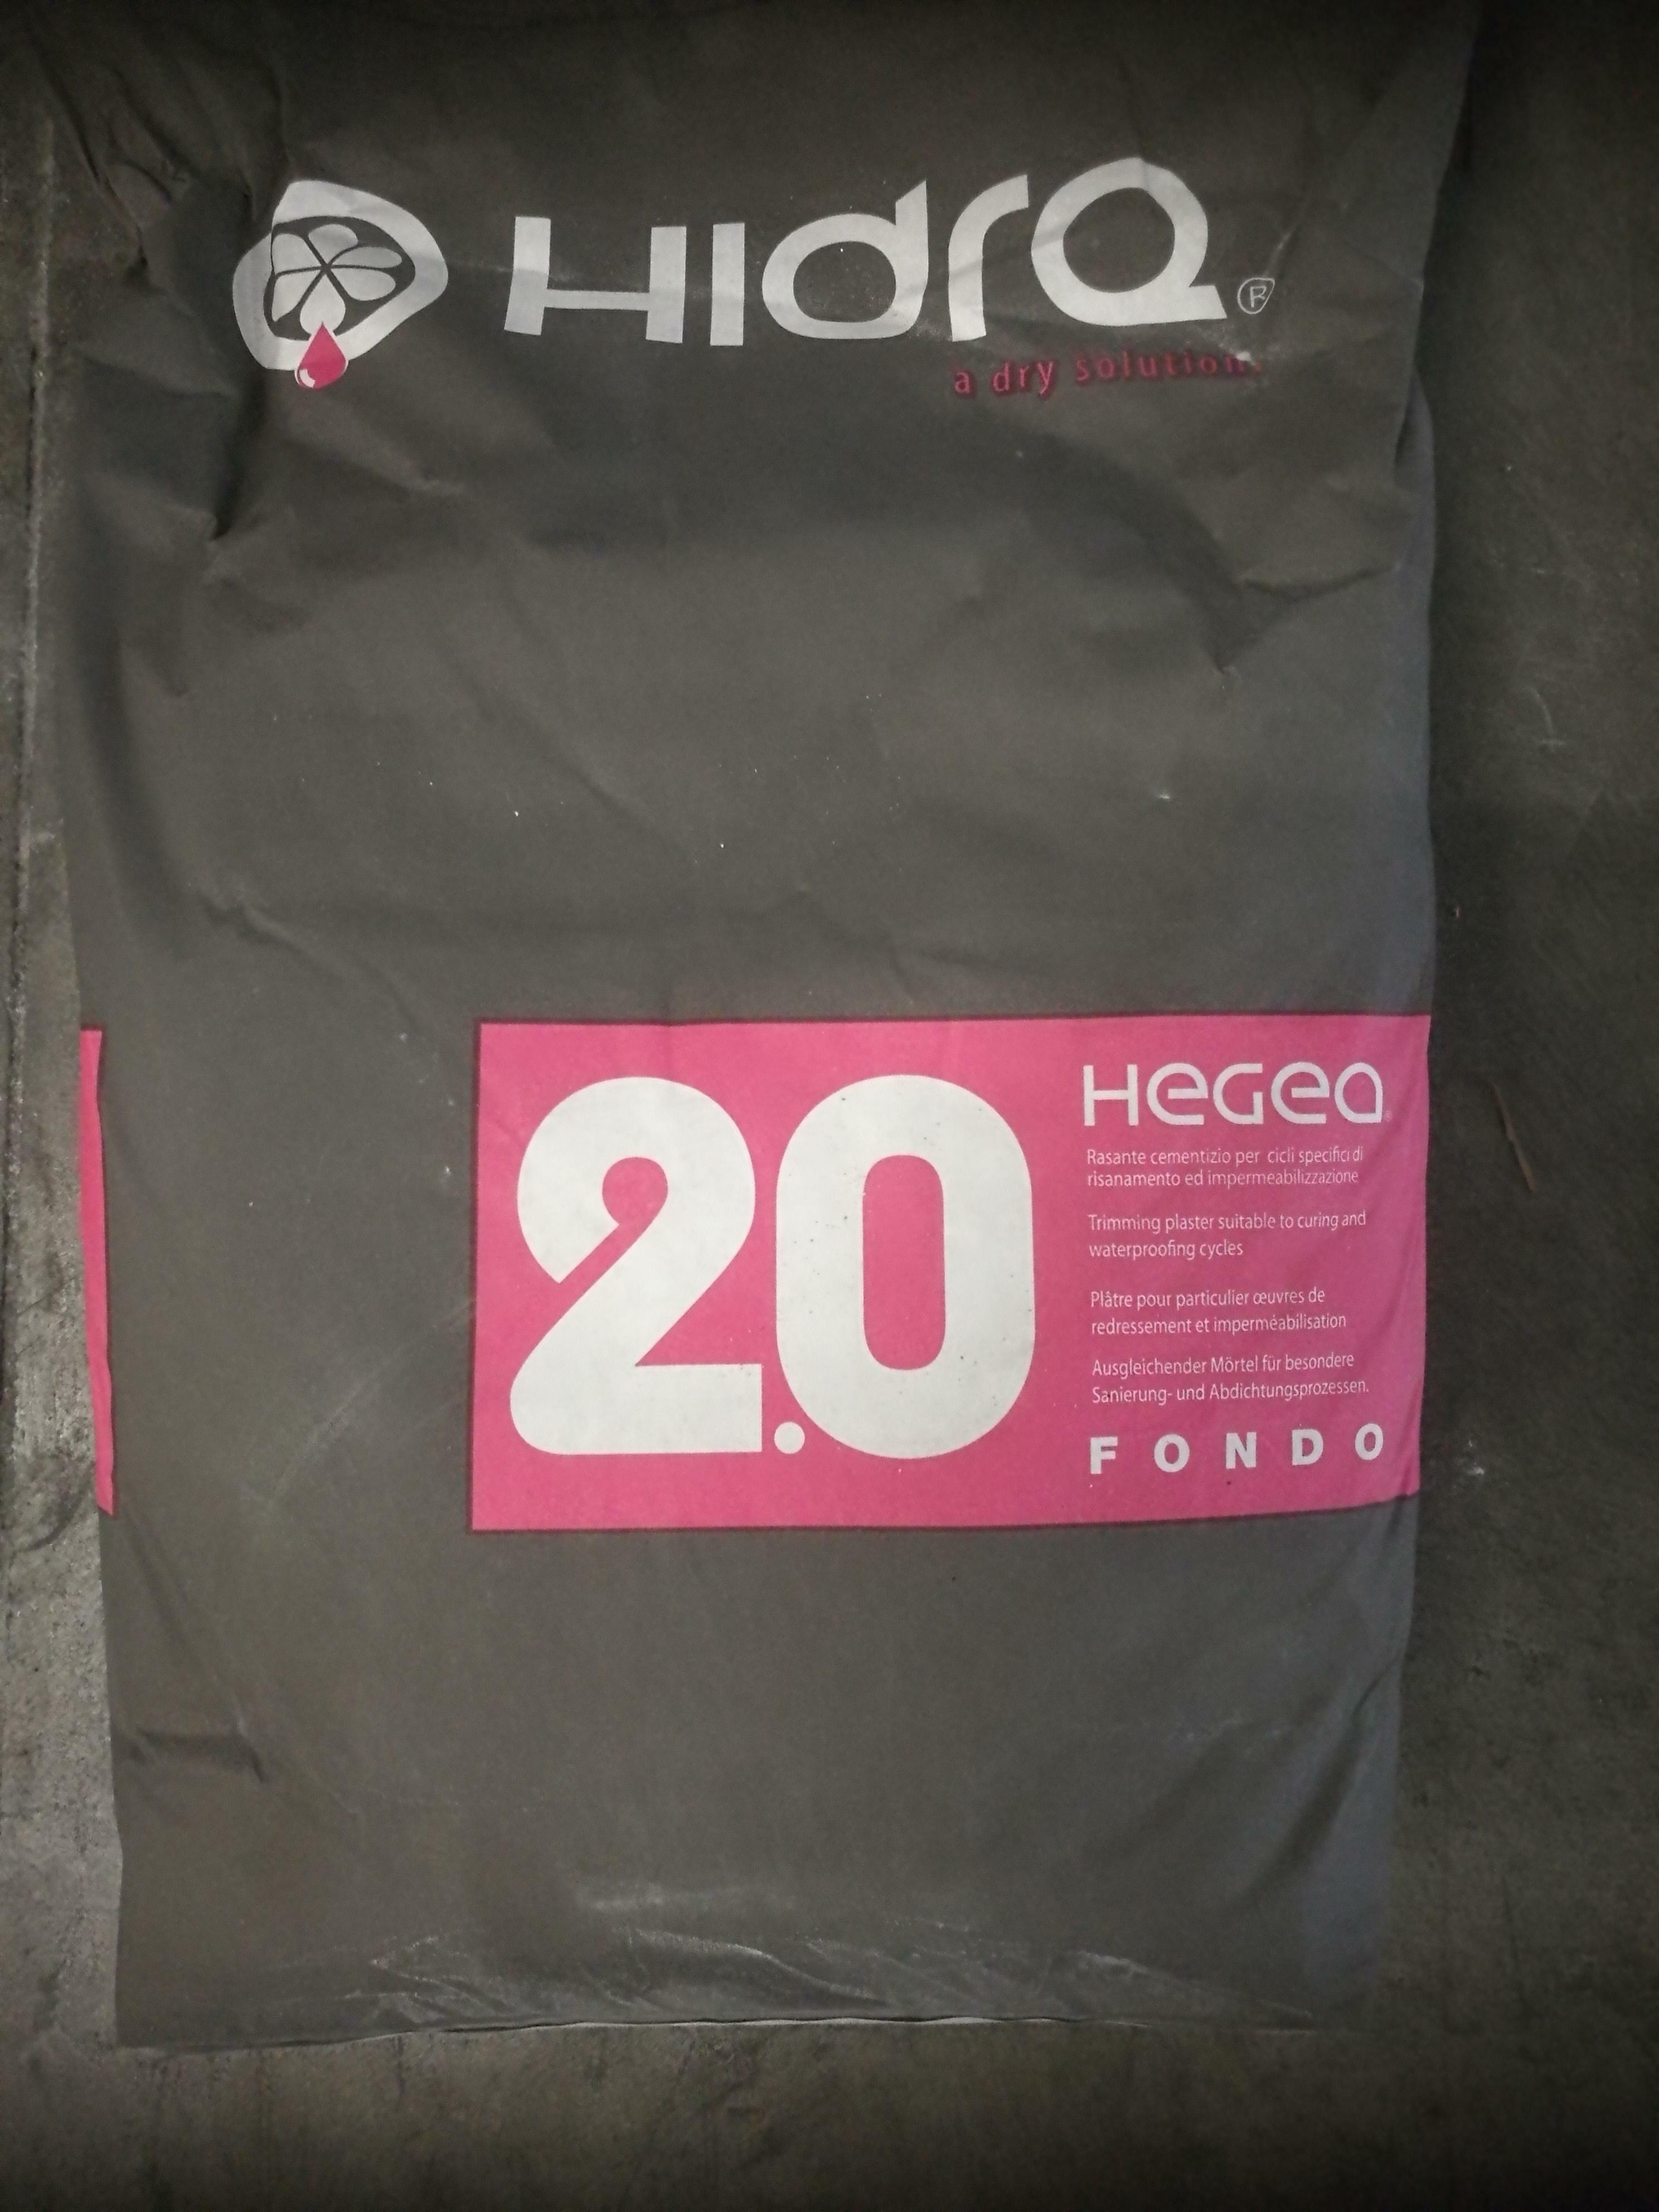 hidra hidra hegea fondo deumidificante 2.0 25 kg